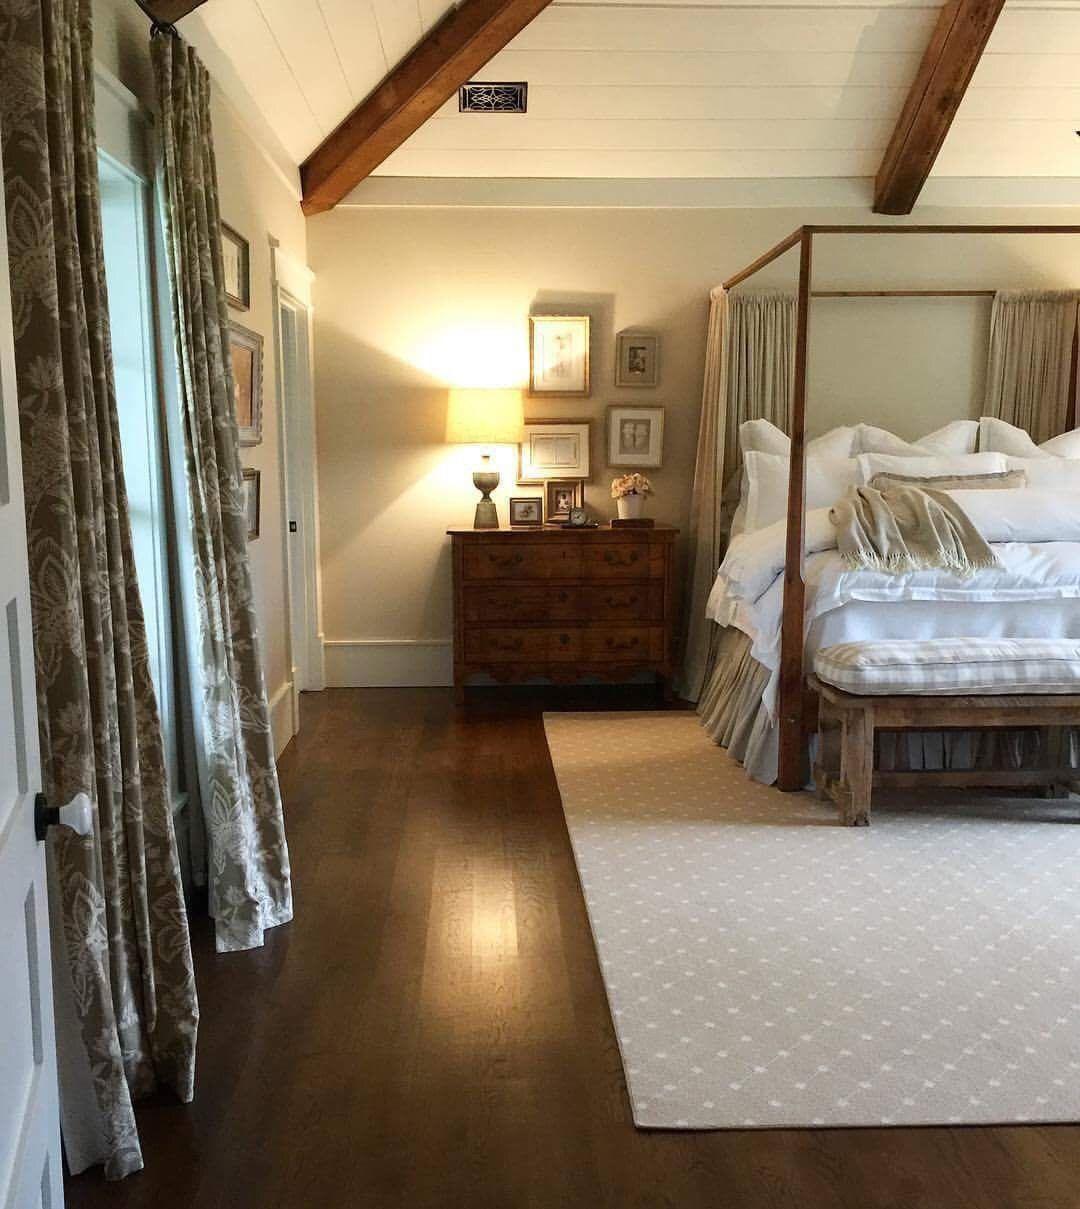 Master bedroom decor  Pin by Ashlyn Dallas on dream home  Pinterest  Neutral